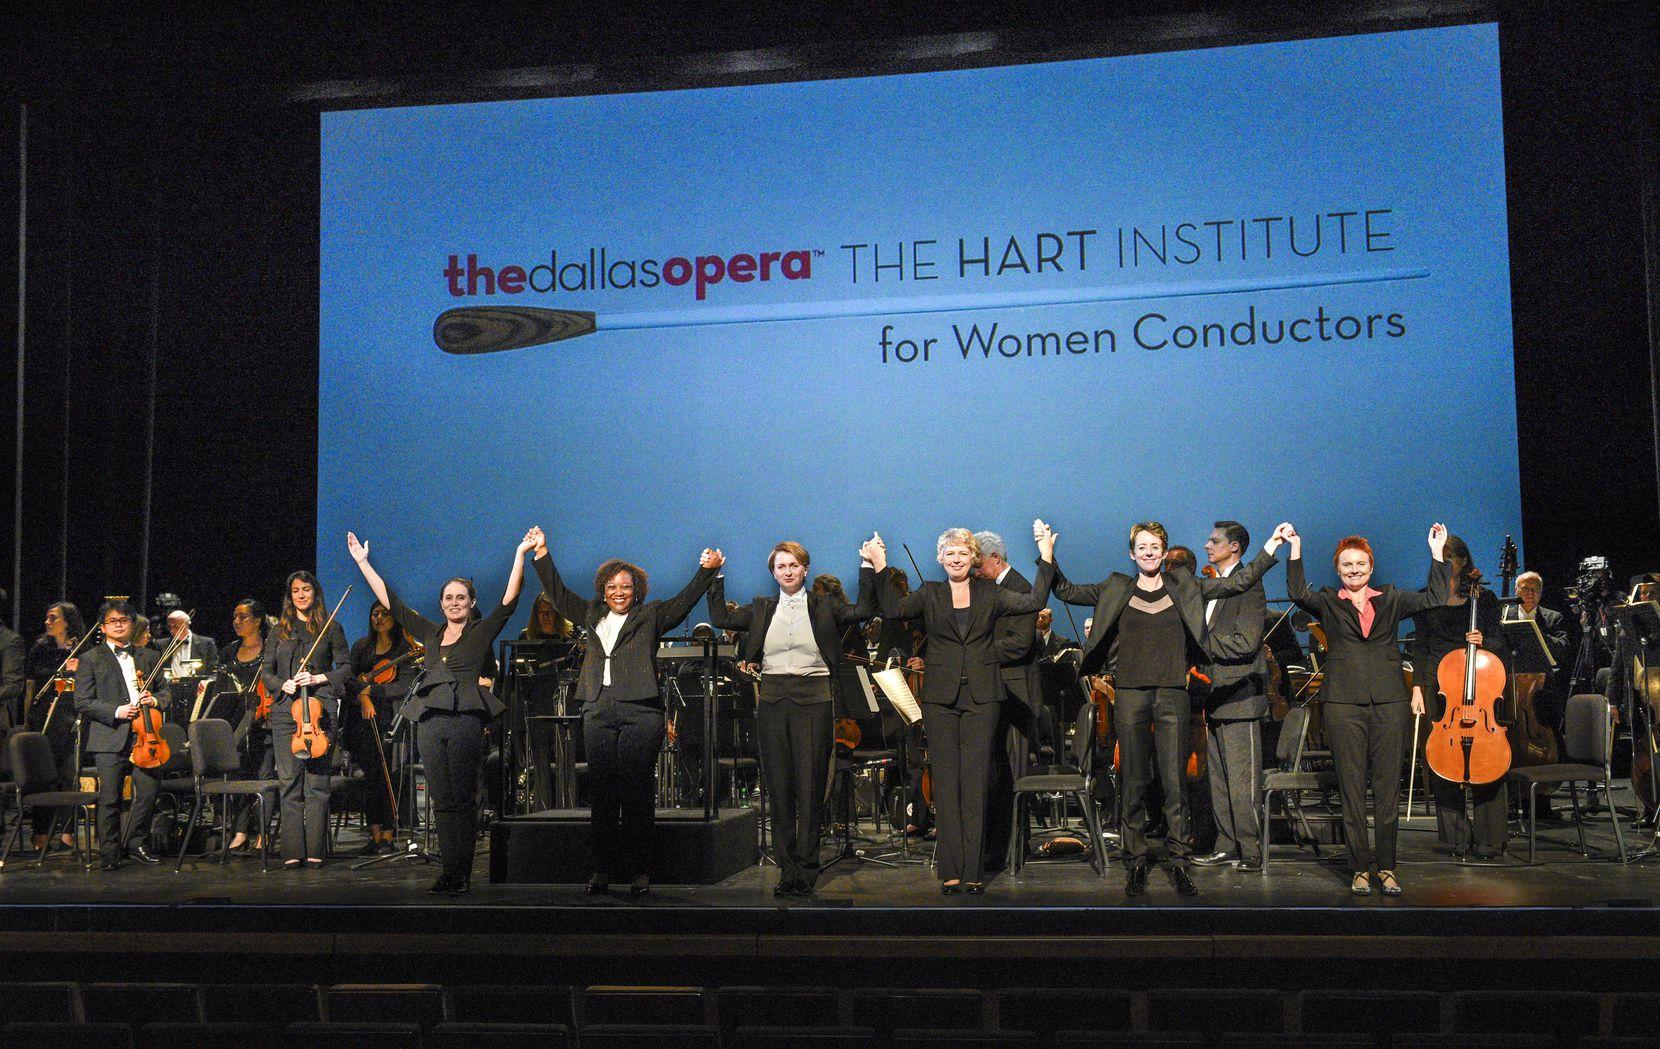 From left: Lina Gonzalez-Granados, Alba Bomfim, Monika Wolinska, Karin Hendrickson, Mélisse Brunet and Carolyn Watson took a bow during the Dallas Opera's Hart Institute for Women Conductors in 2017.